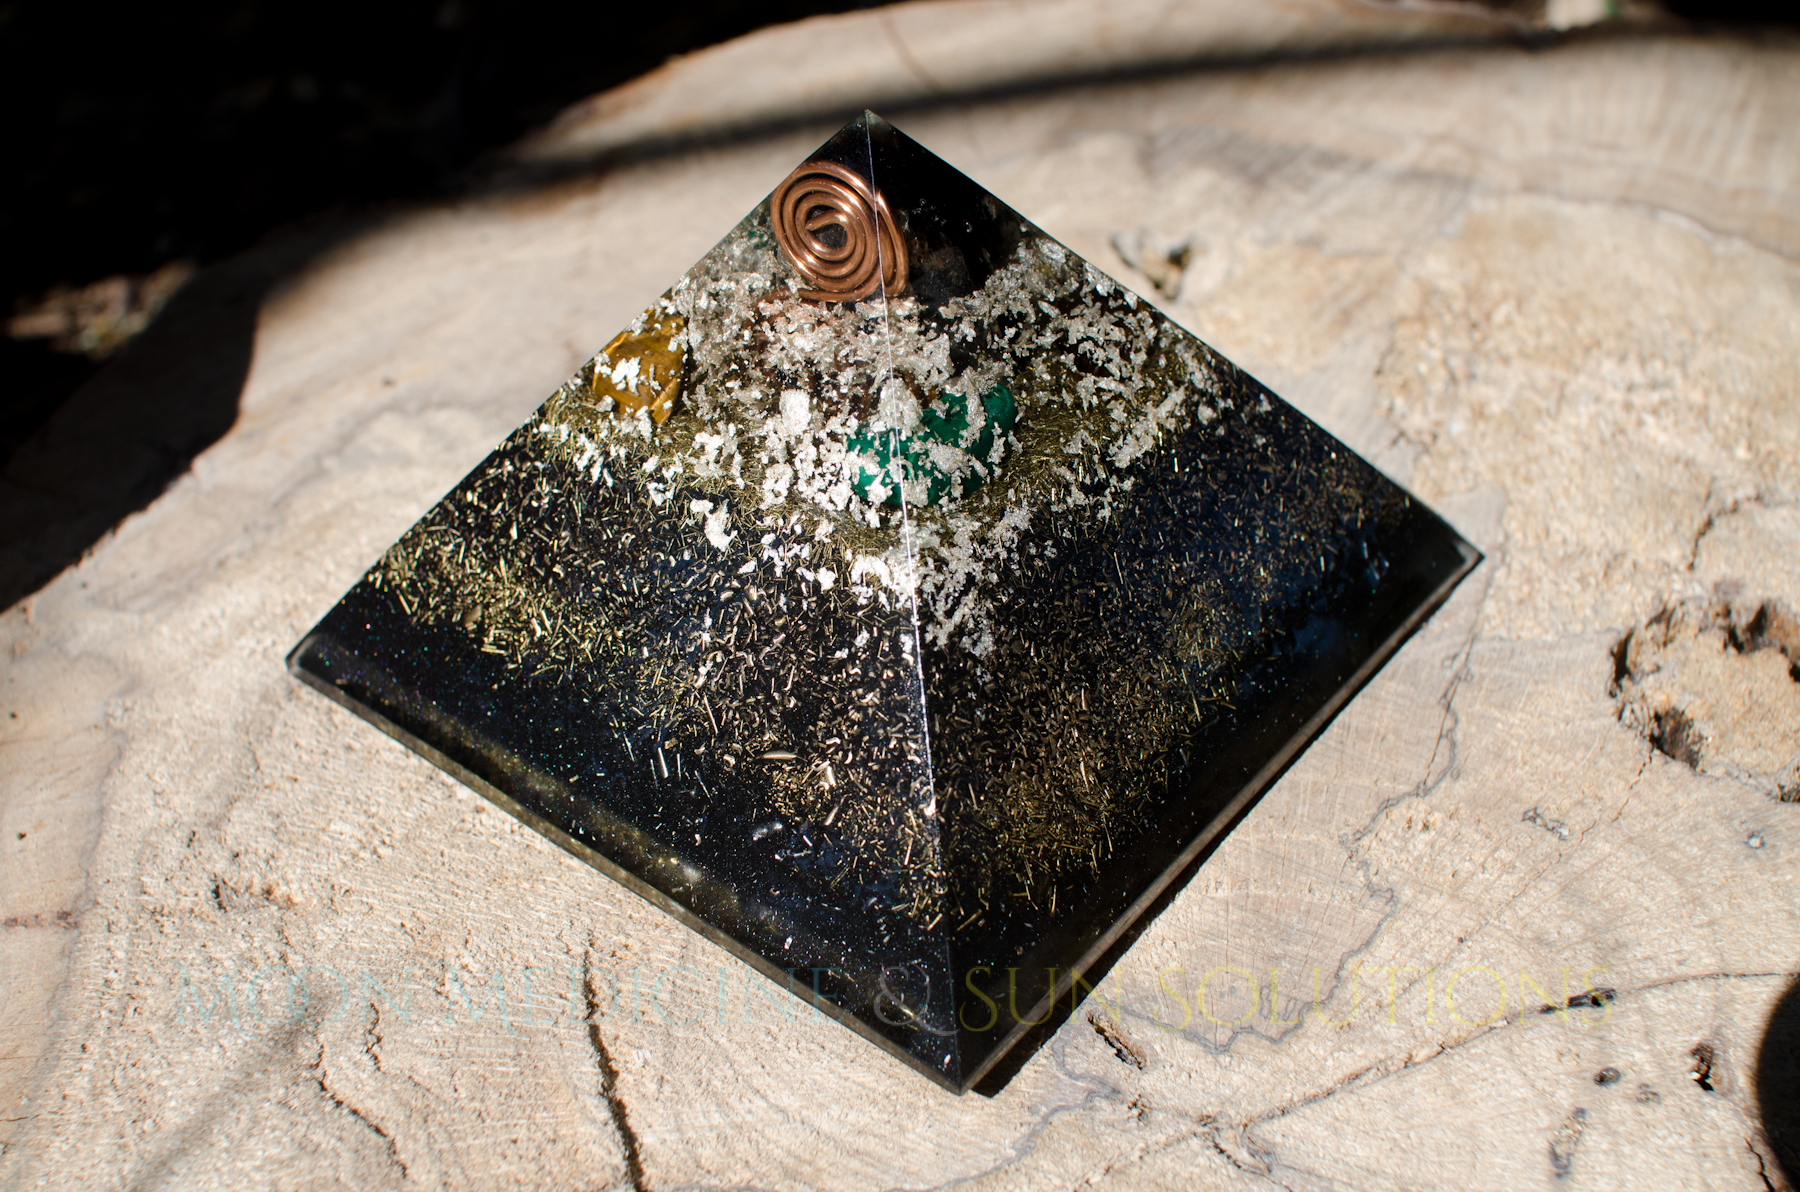 Etheric Caretaker (Cleanses Baggage, Silver to Balance Yang, Smokey Quartz to Dispel) - $188-9138.jpg